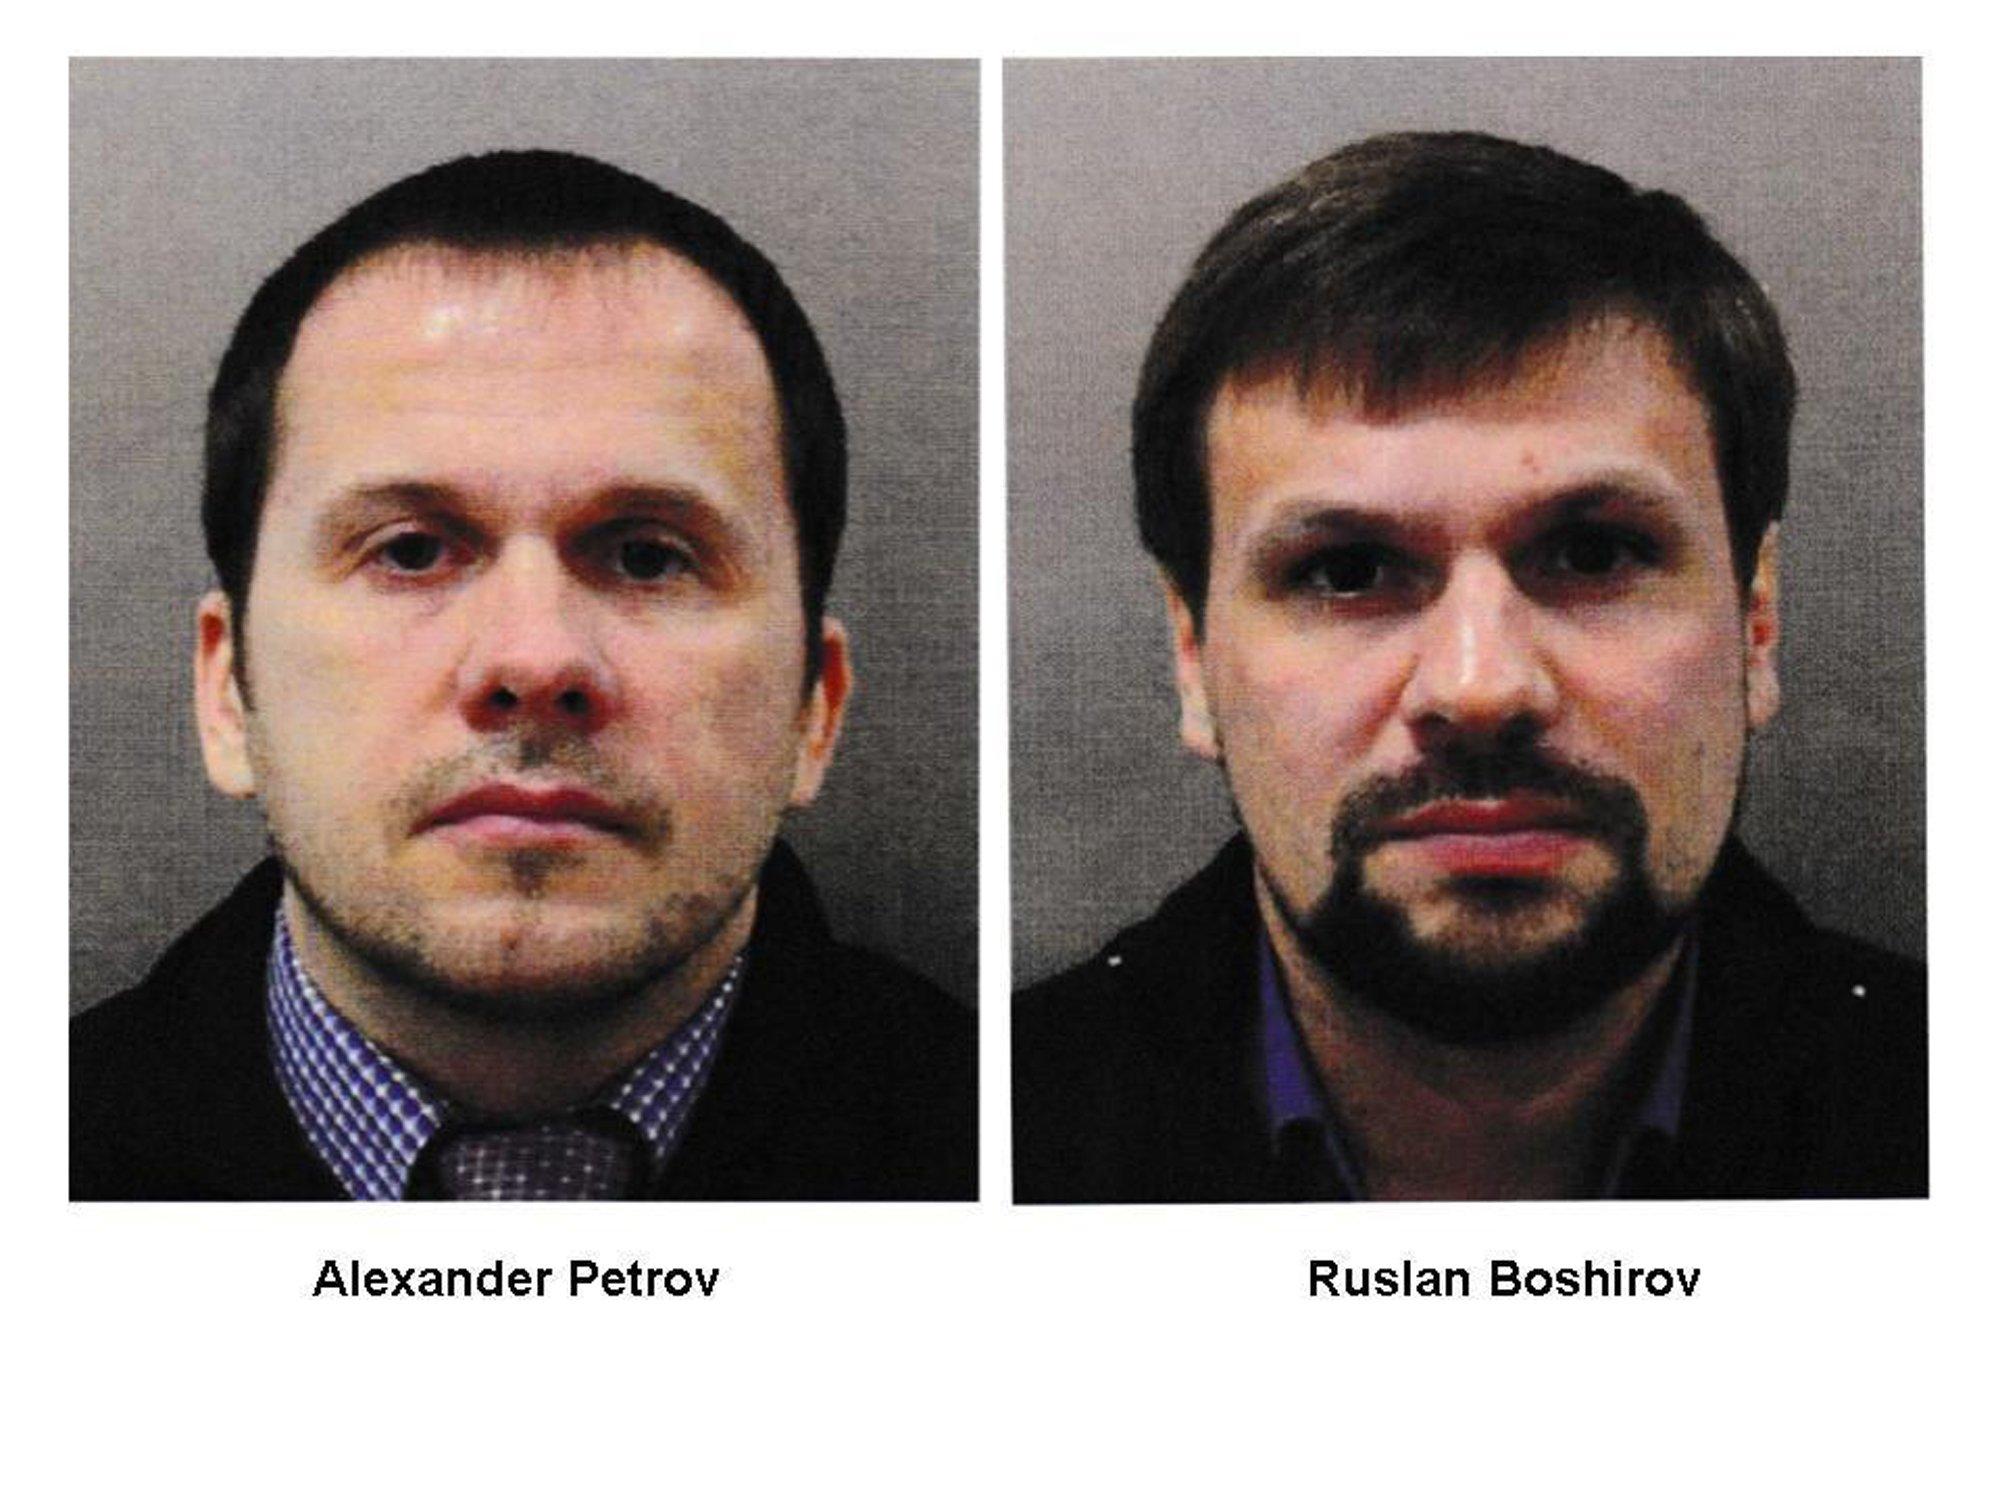 Petrov, Boshirov, Colonel Chepiga. And who do you actually believe 1